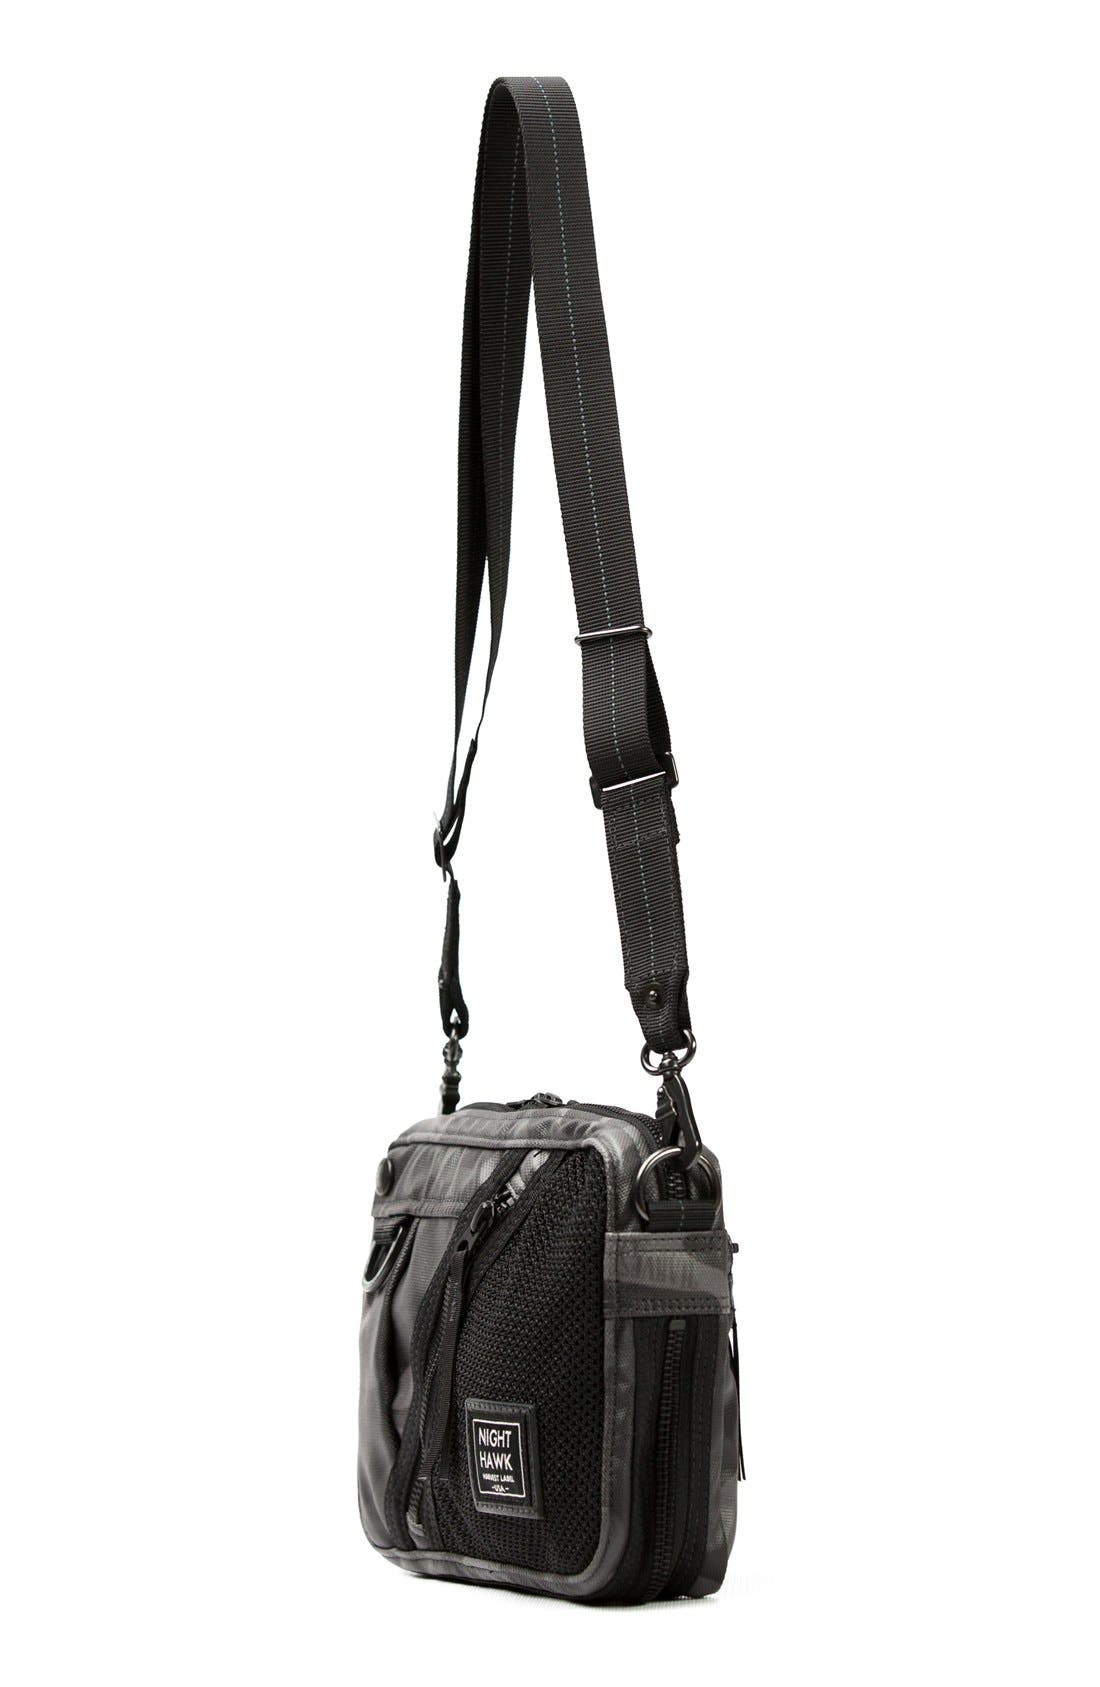 'NightHawk' Shoulder Bag,                             Alternate thumbnail 6, color,                             Camo